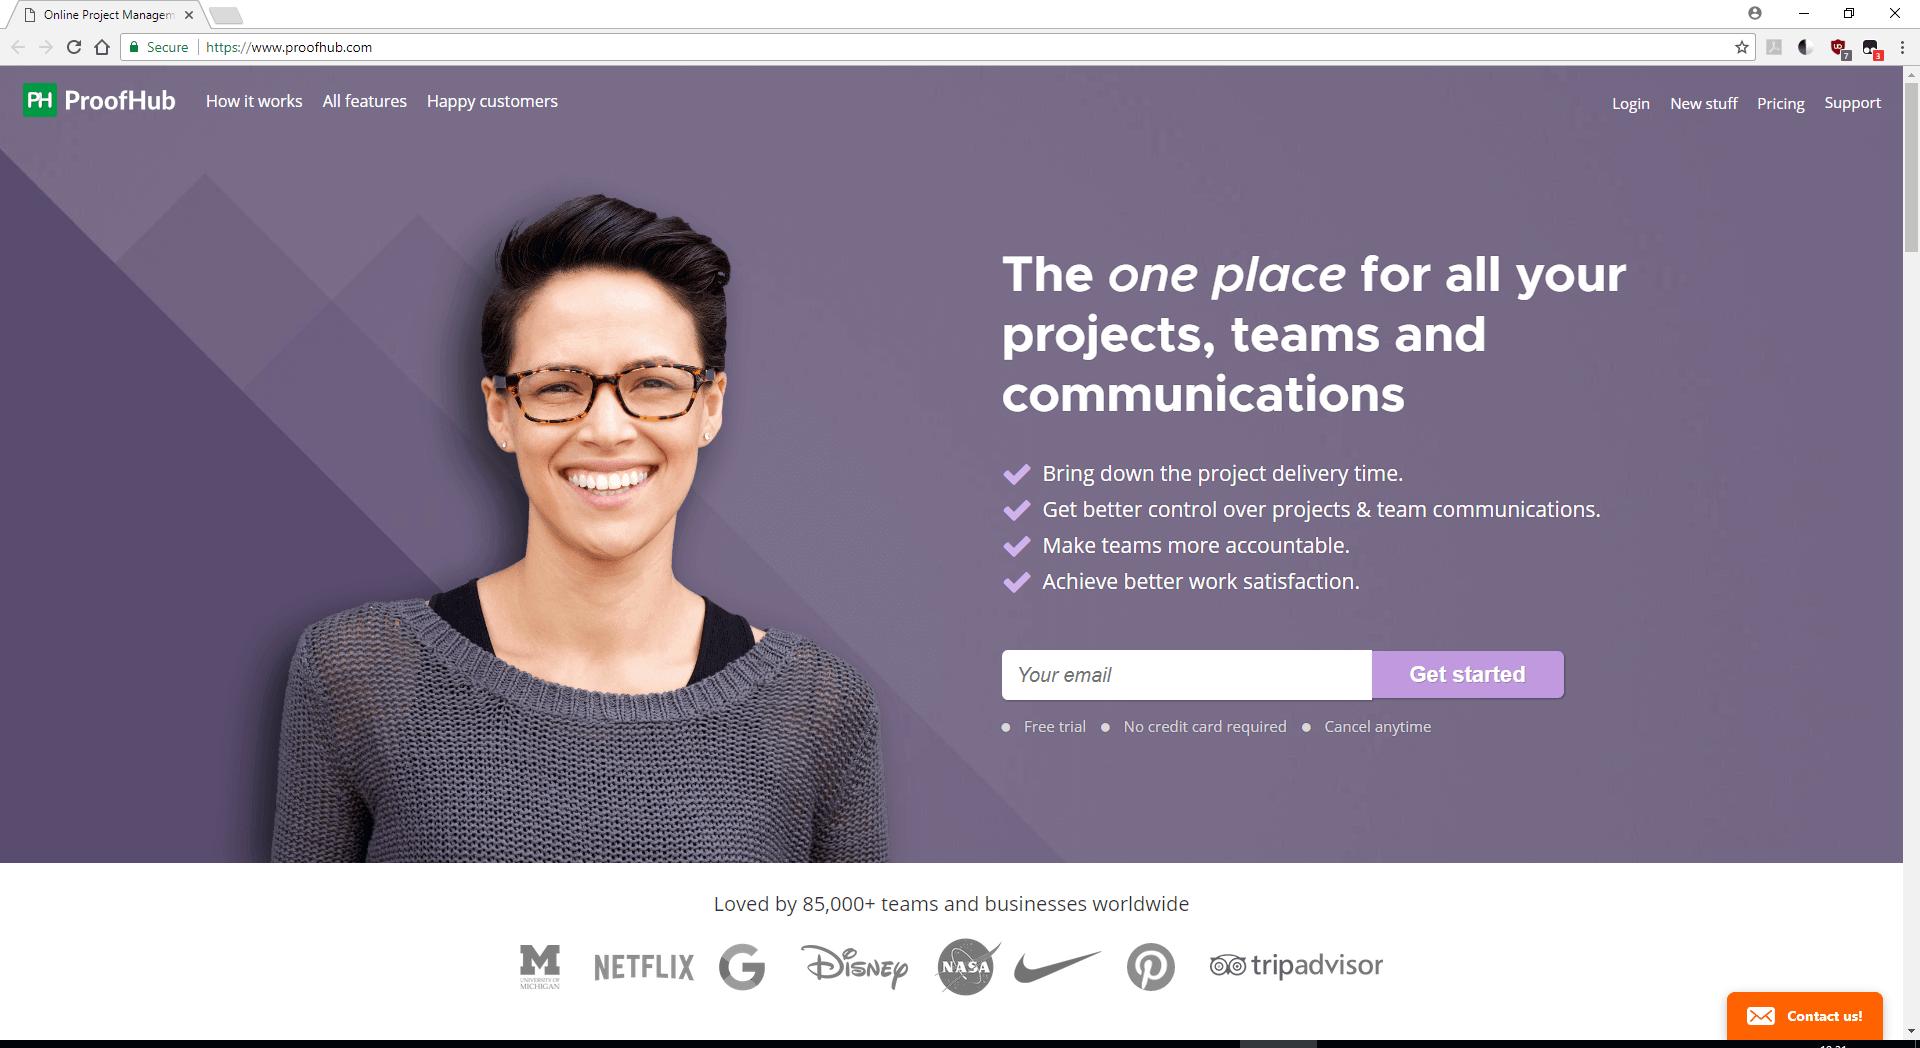 proofhub.com